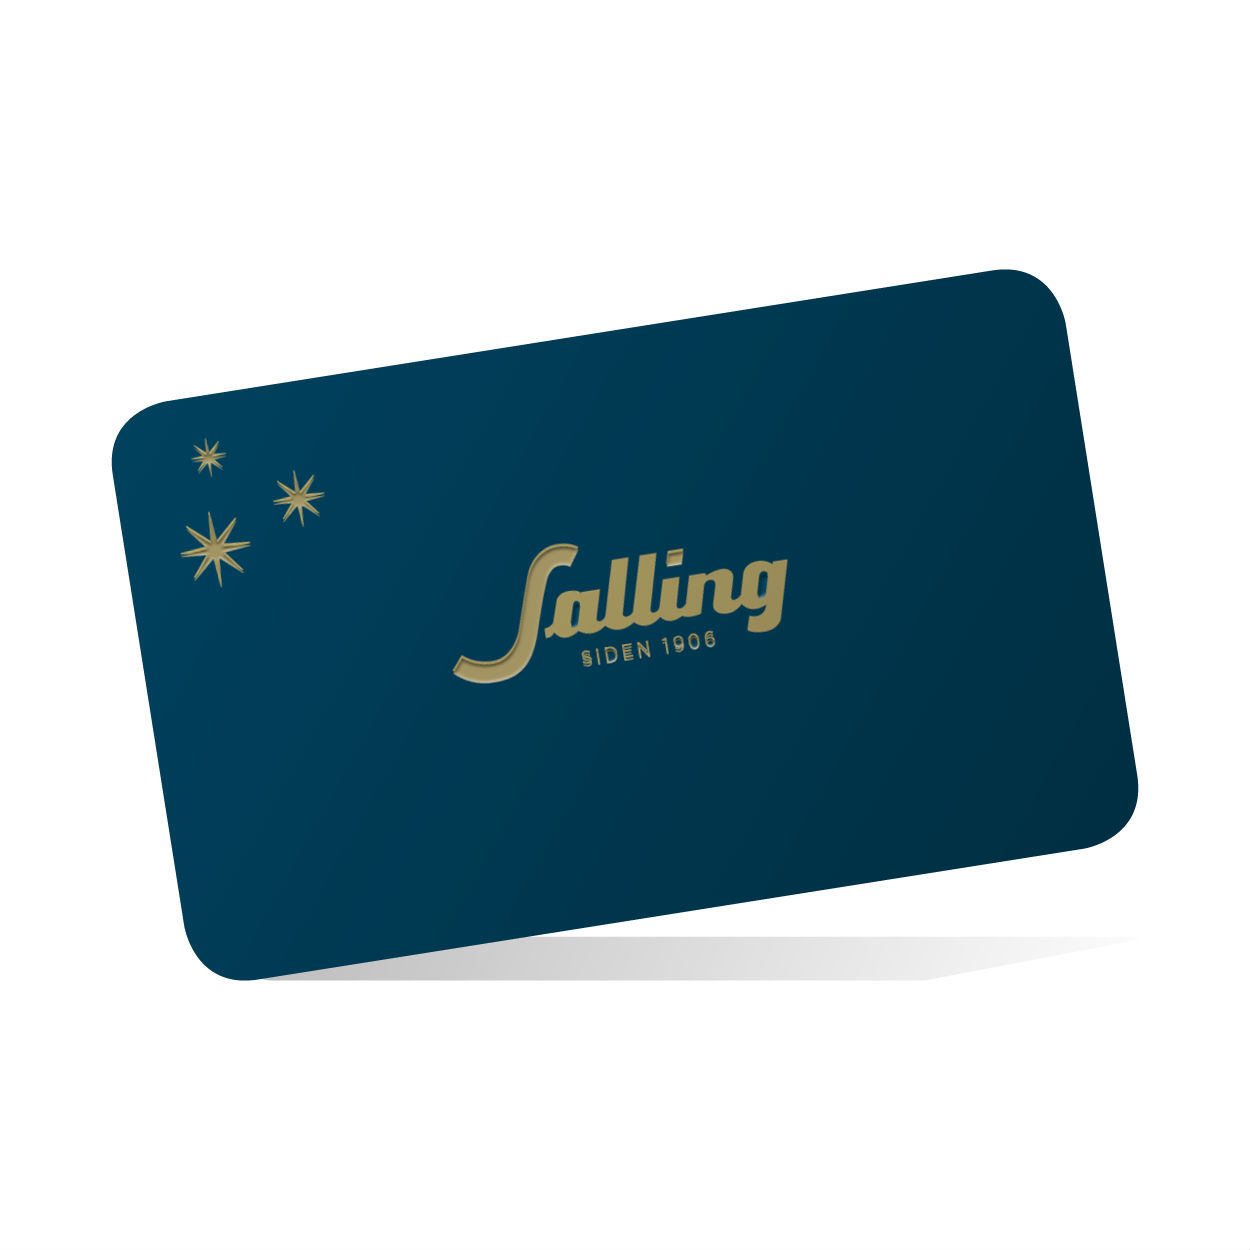 Salling gavekort - 1500 kr